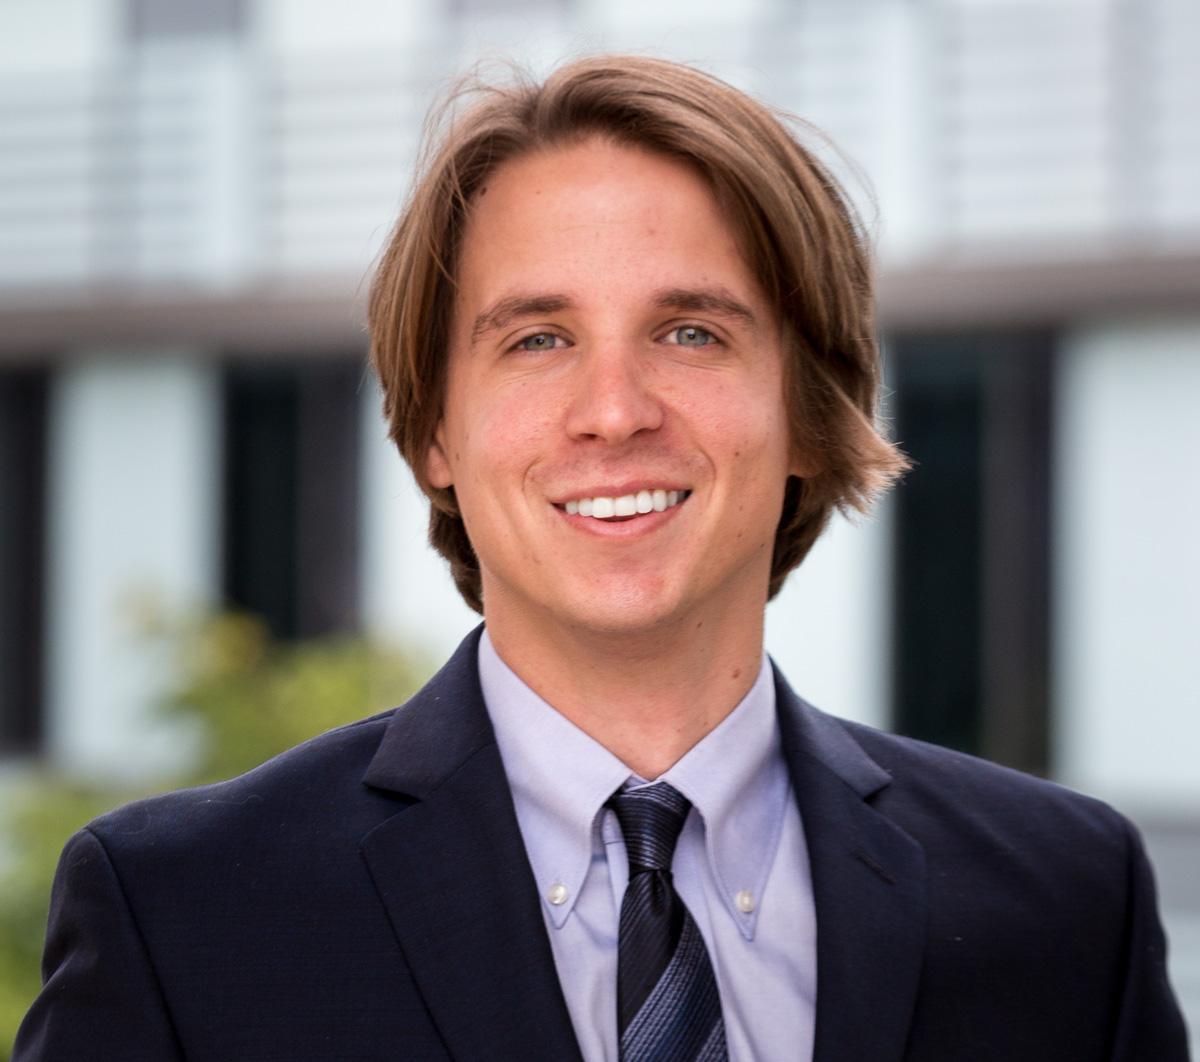 Dr. Sean Grant